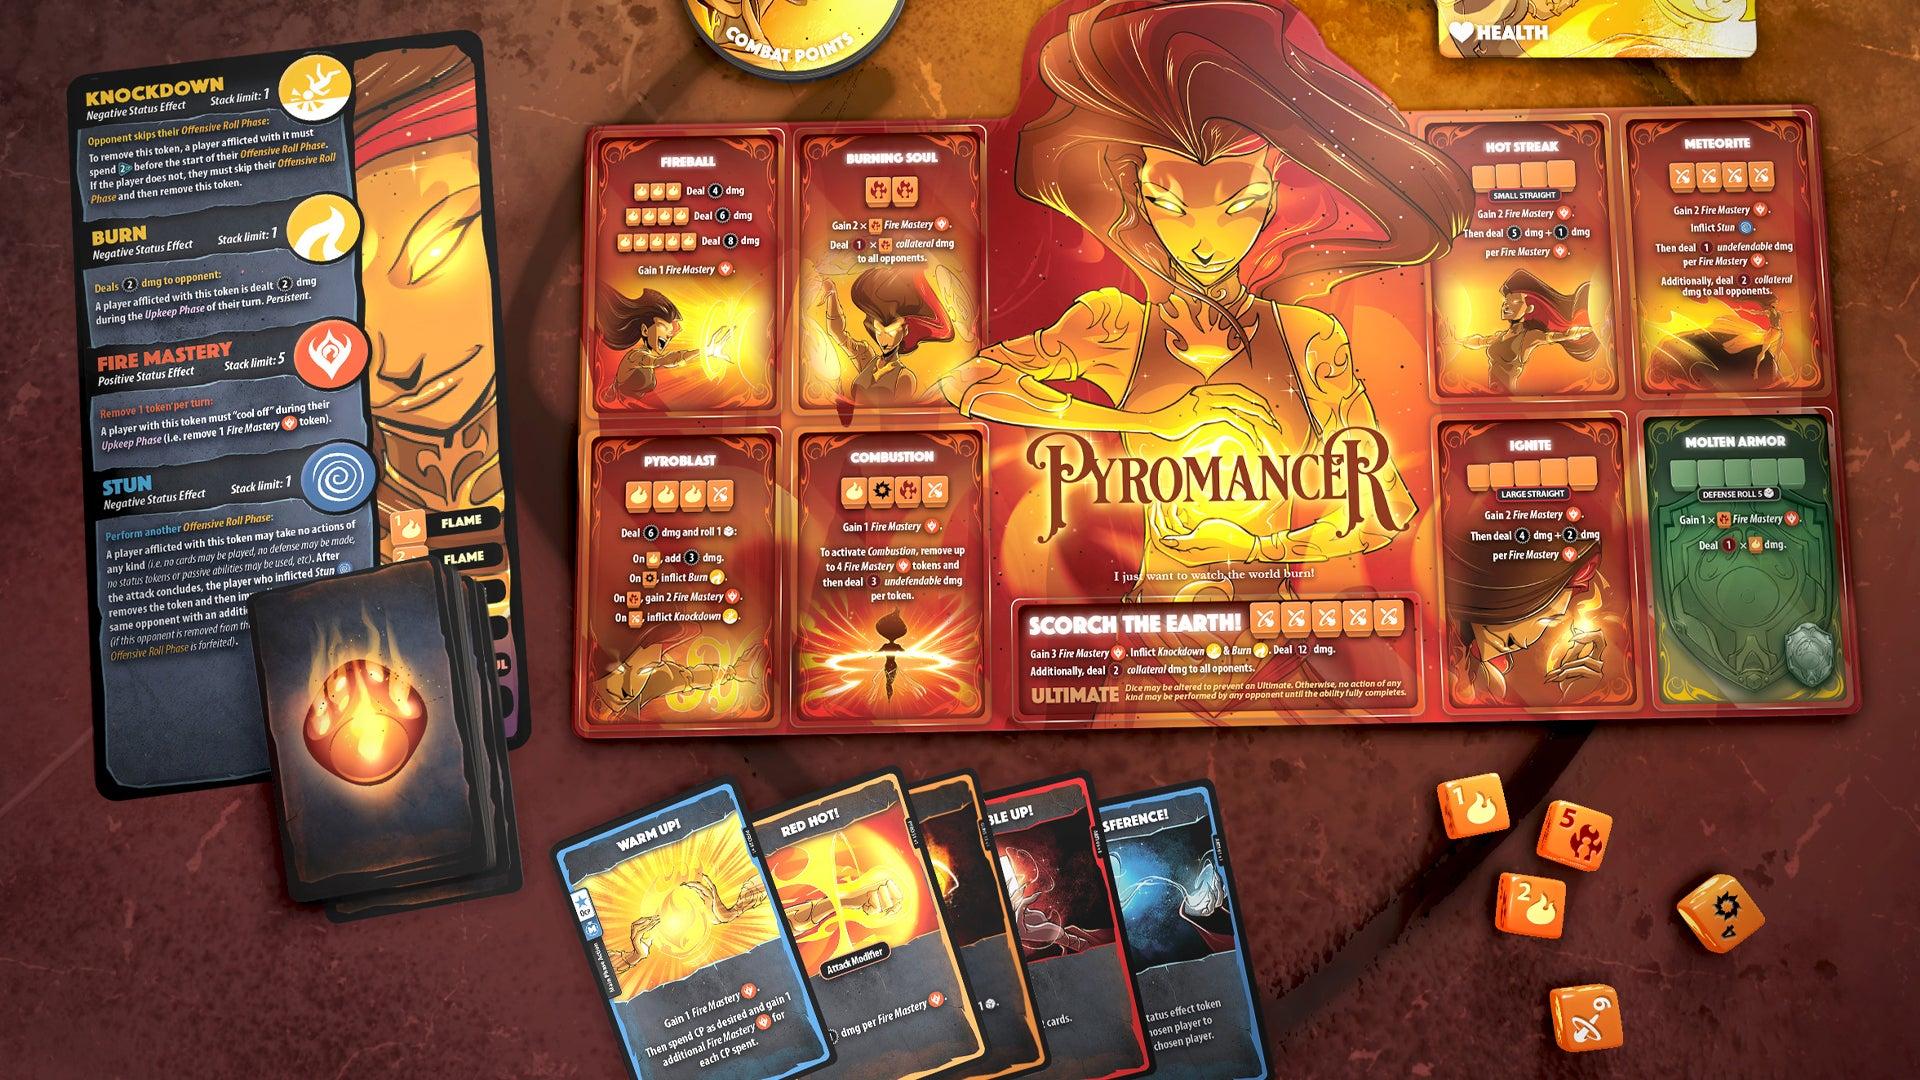 Dice Throne: Season One board game Pyro character board